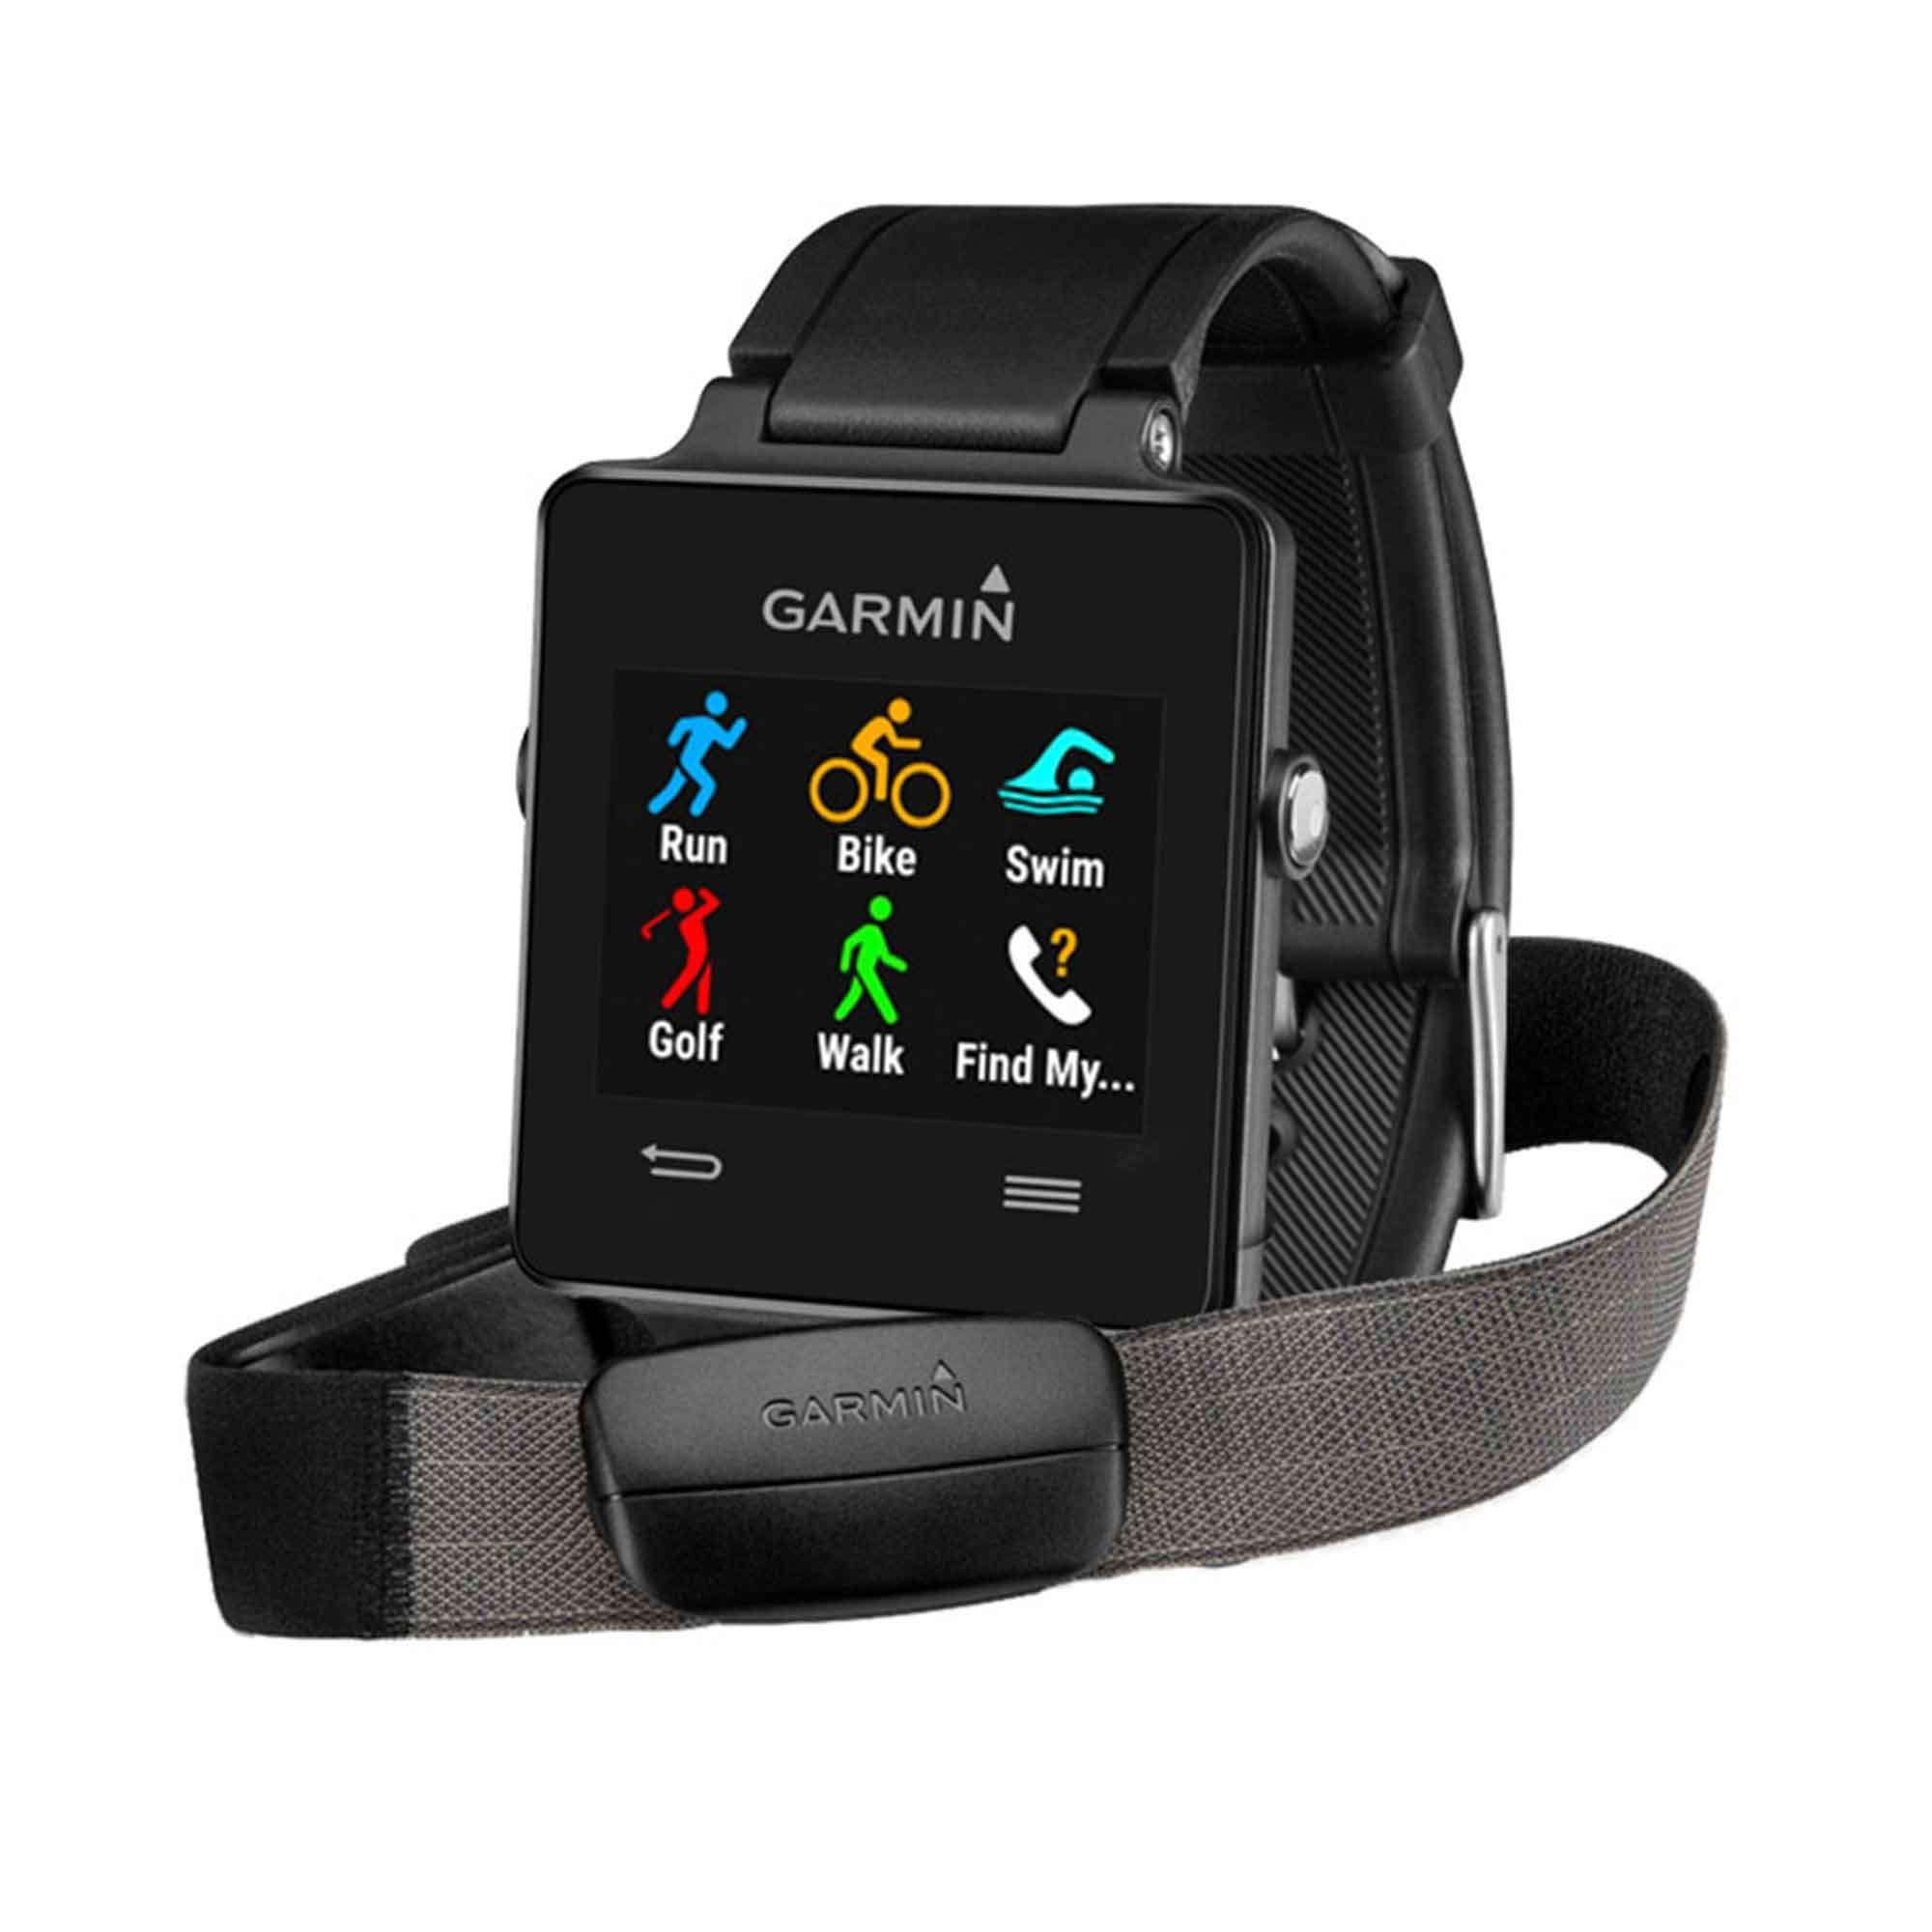 smartwatch-con-gps-garmin-vivoactive-con-fascia-cardio-premium-14697